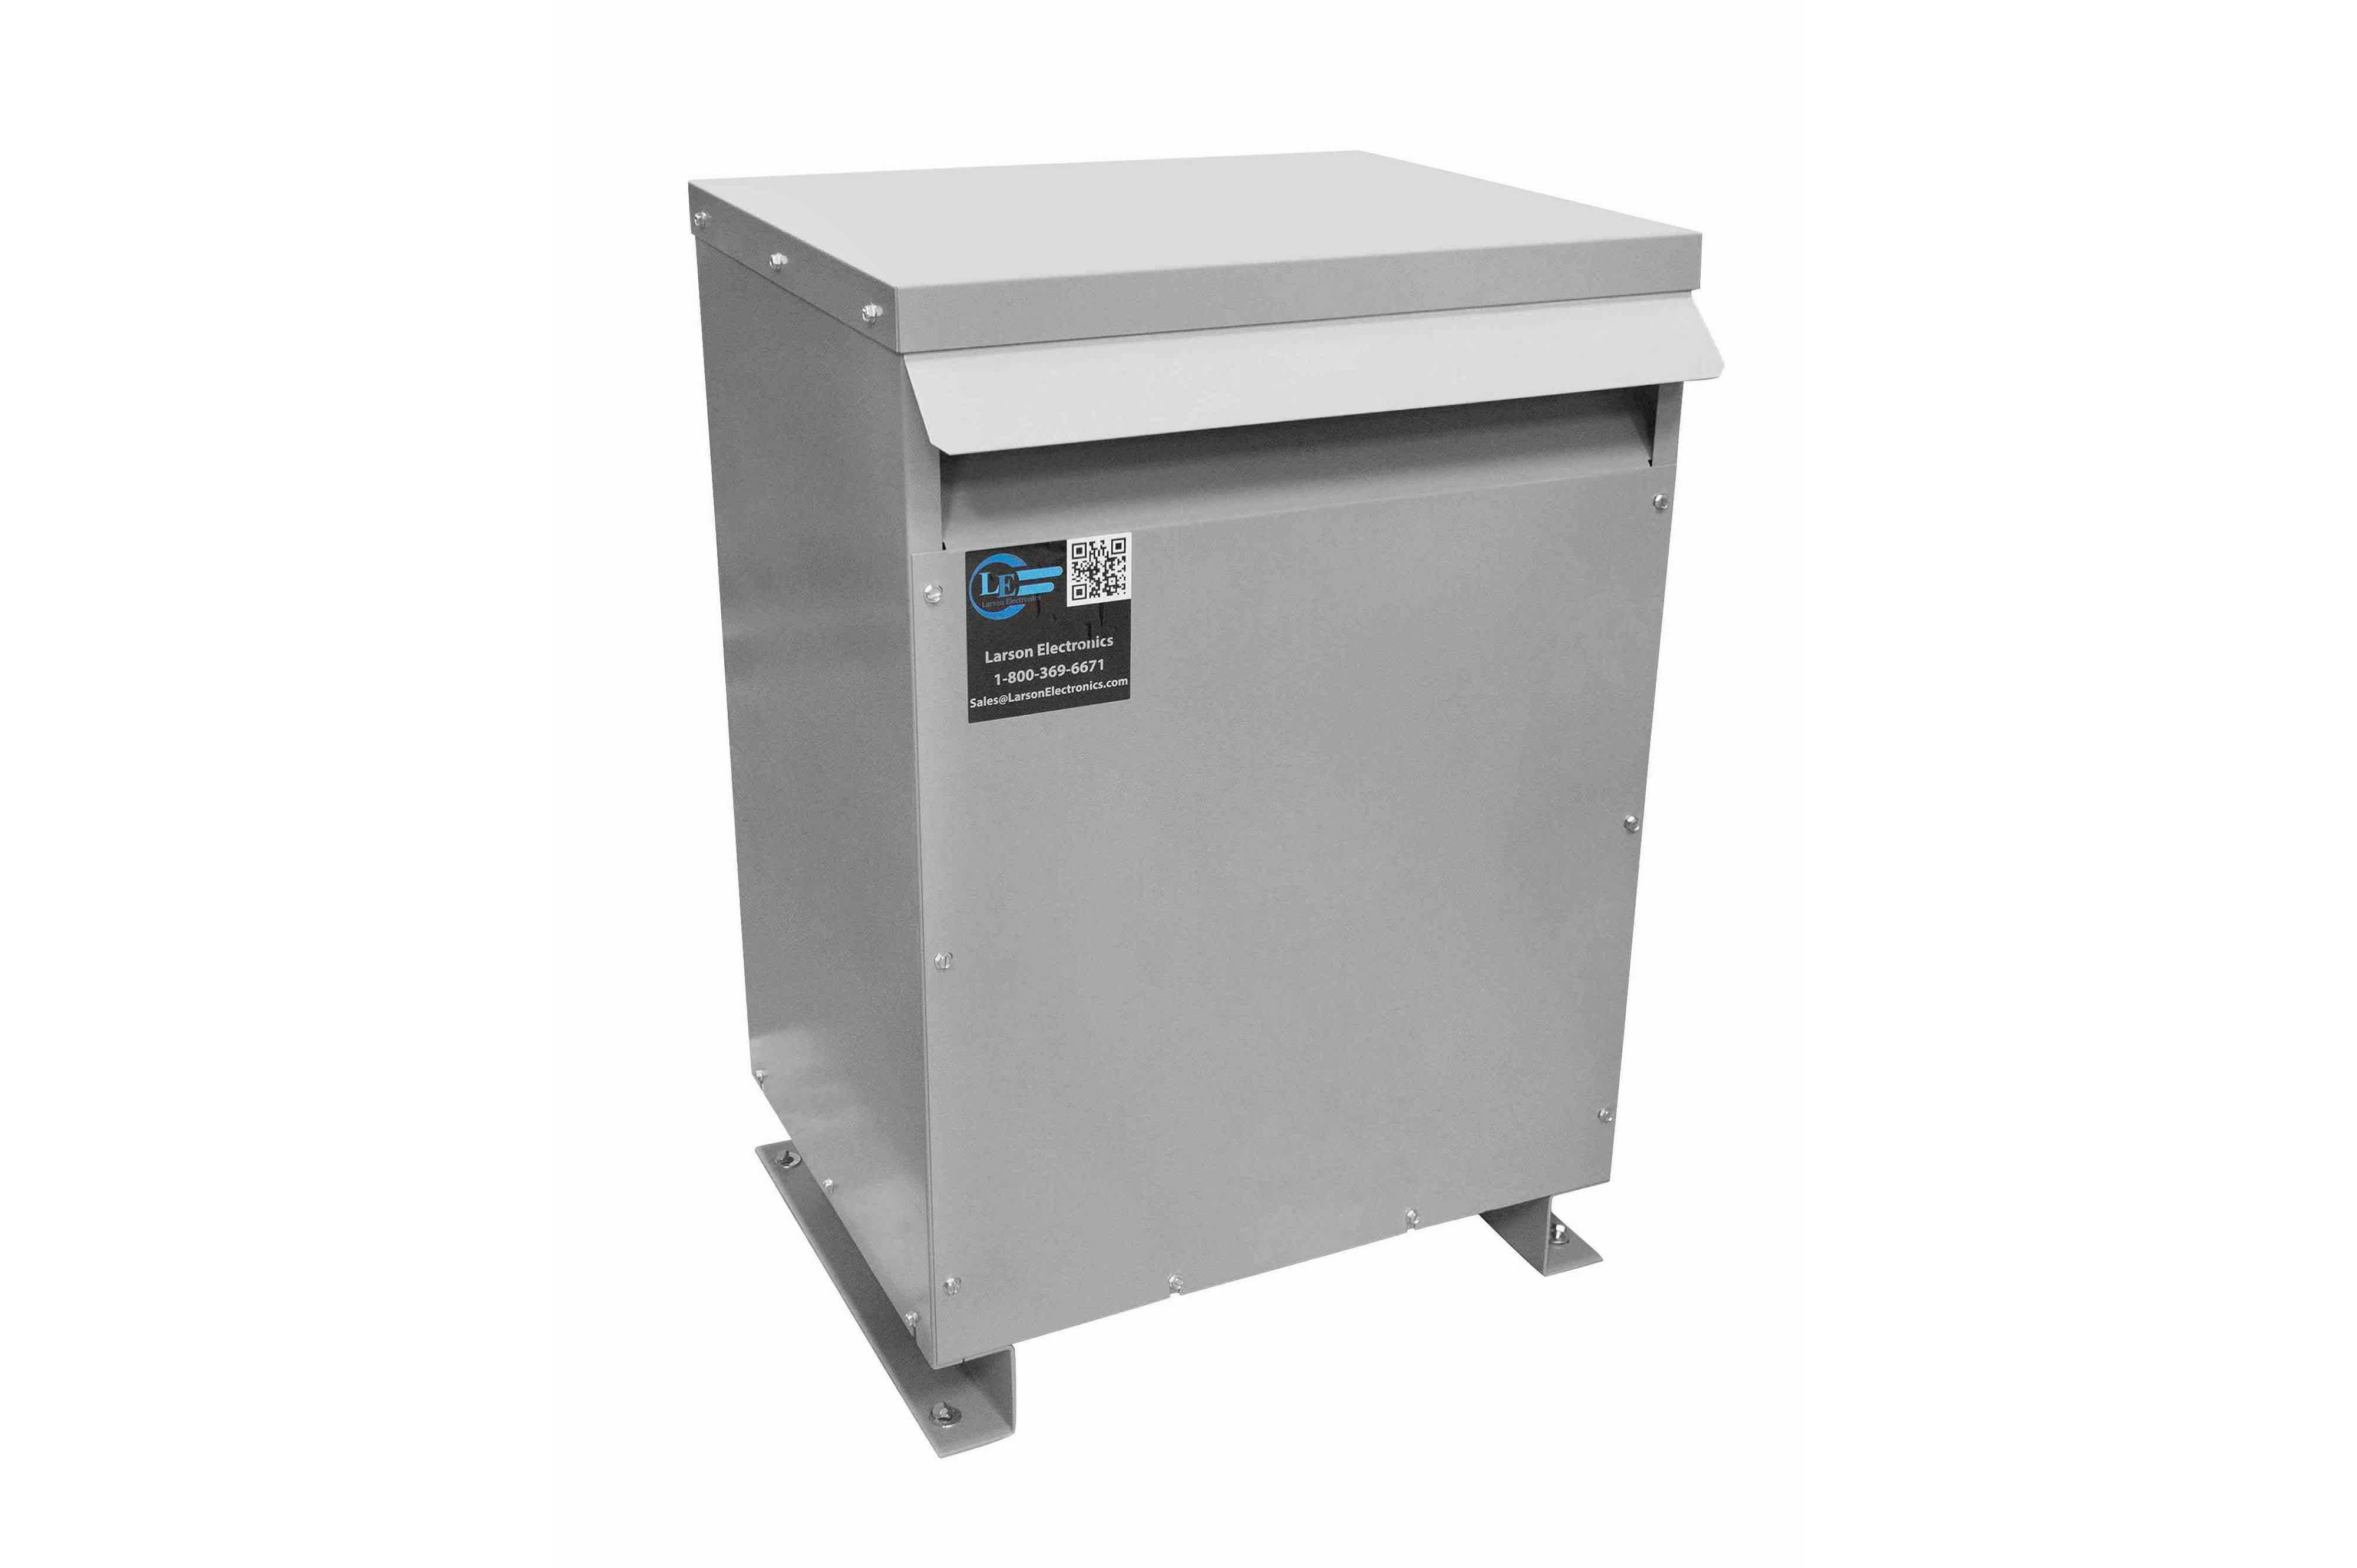 15 kVA 3PH Isolation Transformer, 575V Wye Primary, 415Y/240 Wye-N Secondary, N3R, Ventilated, 60 Hz